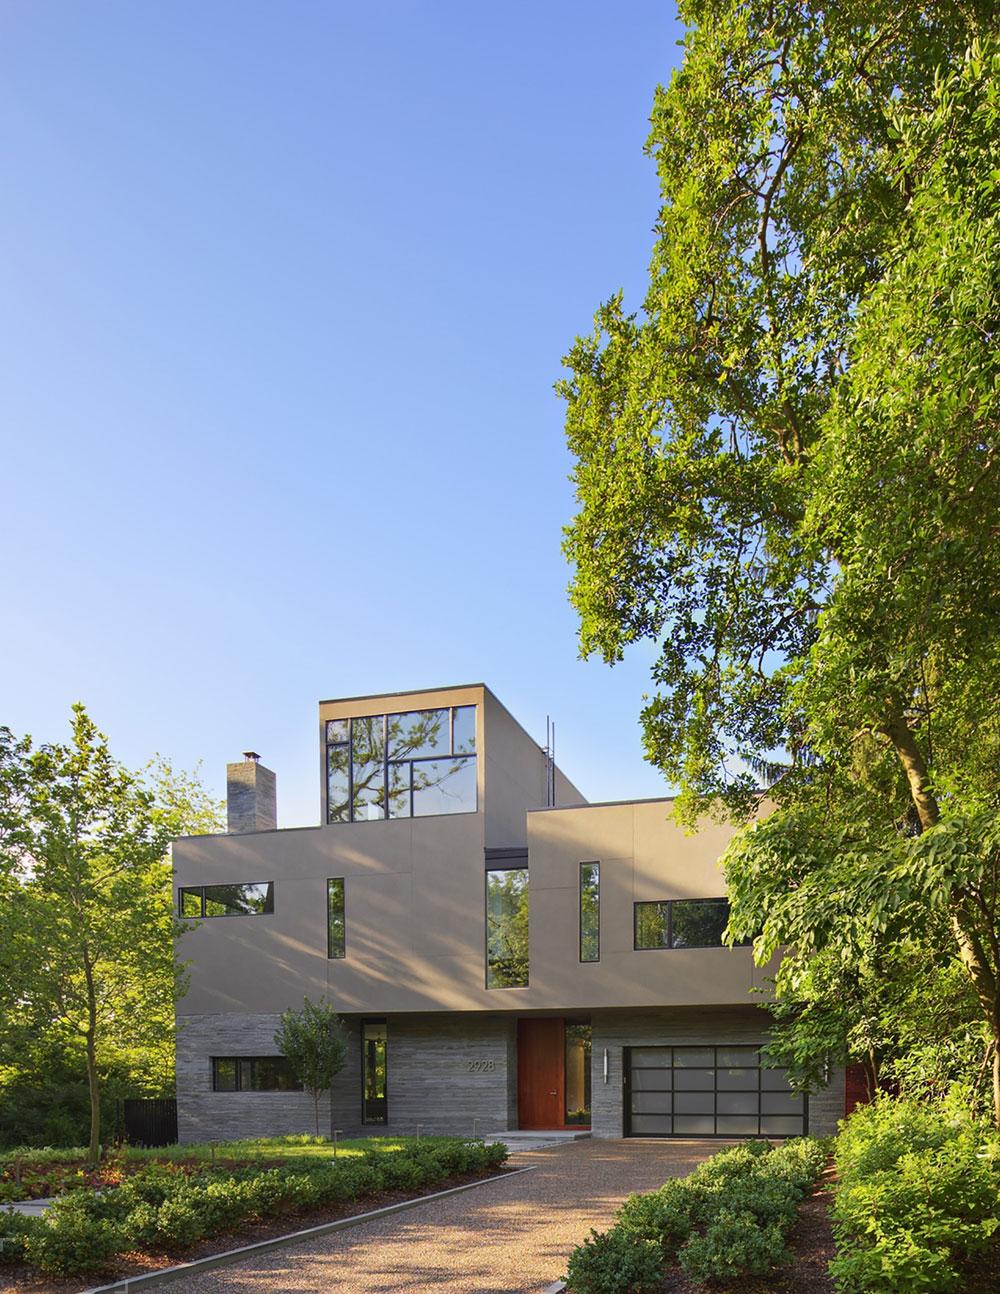 Brandywine House in Washington, DC by Robert M. Gurney